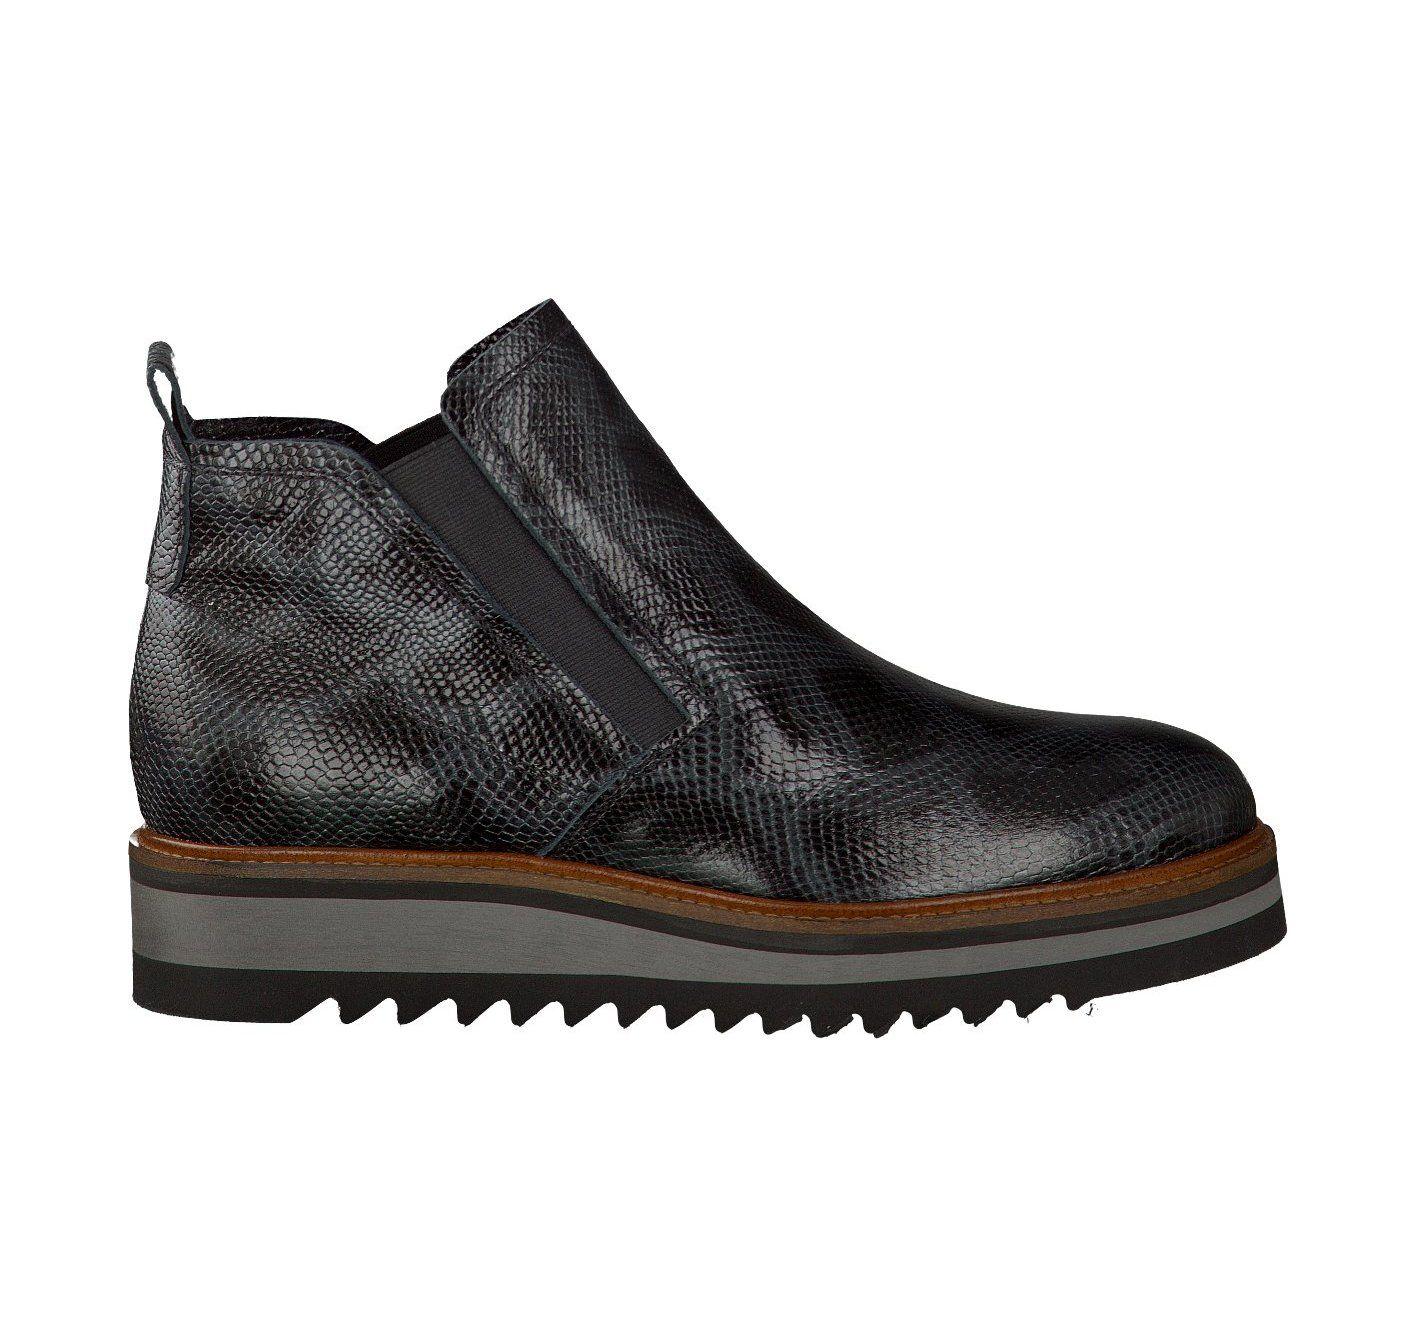 72c50f3531610f Maripé Flache Boots für Damen (Grau Schwarz)